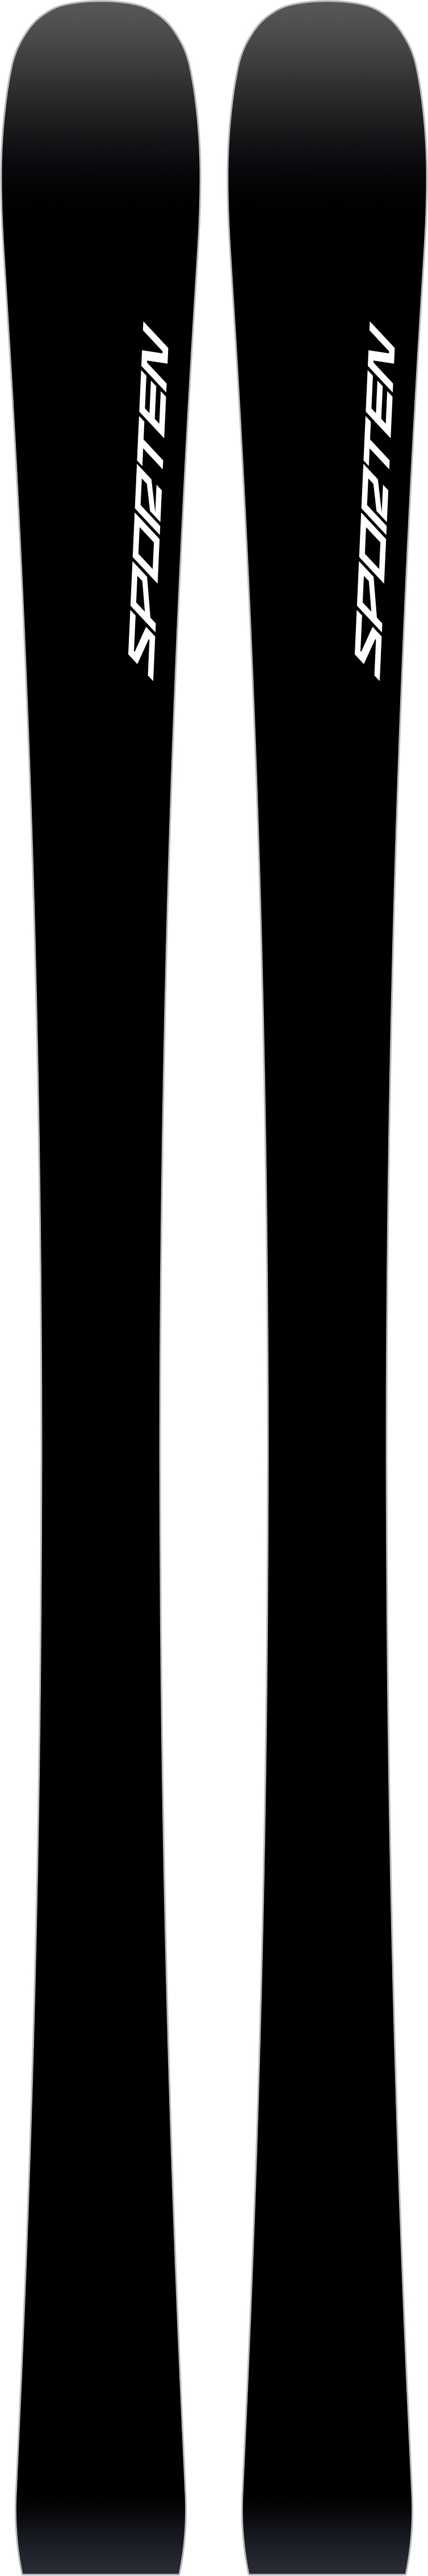 Iridium 5 base.jpg